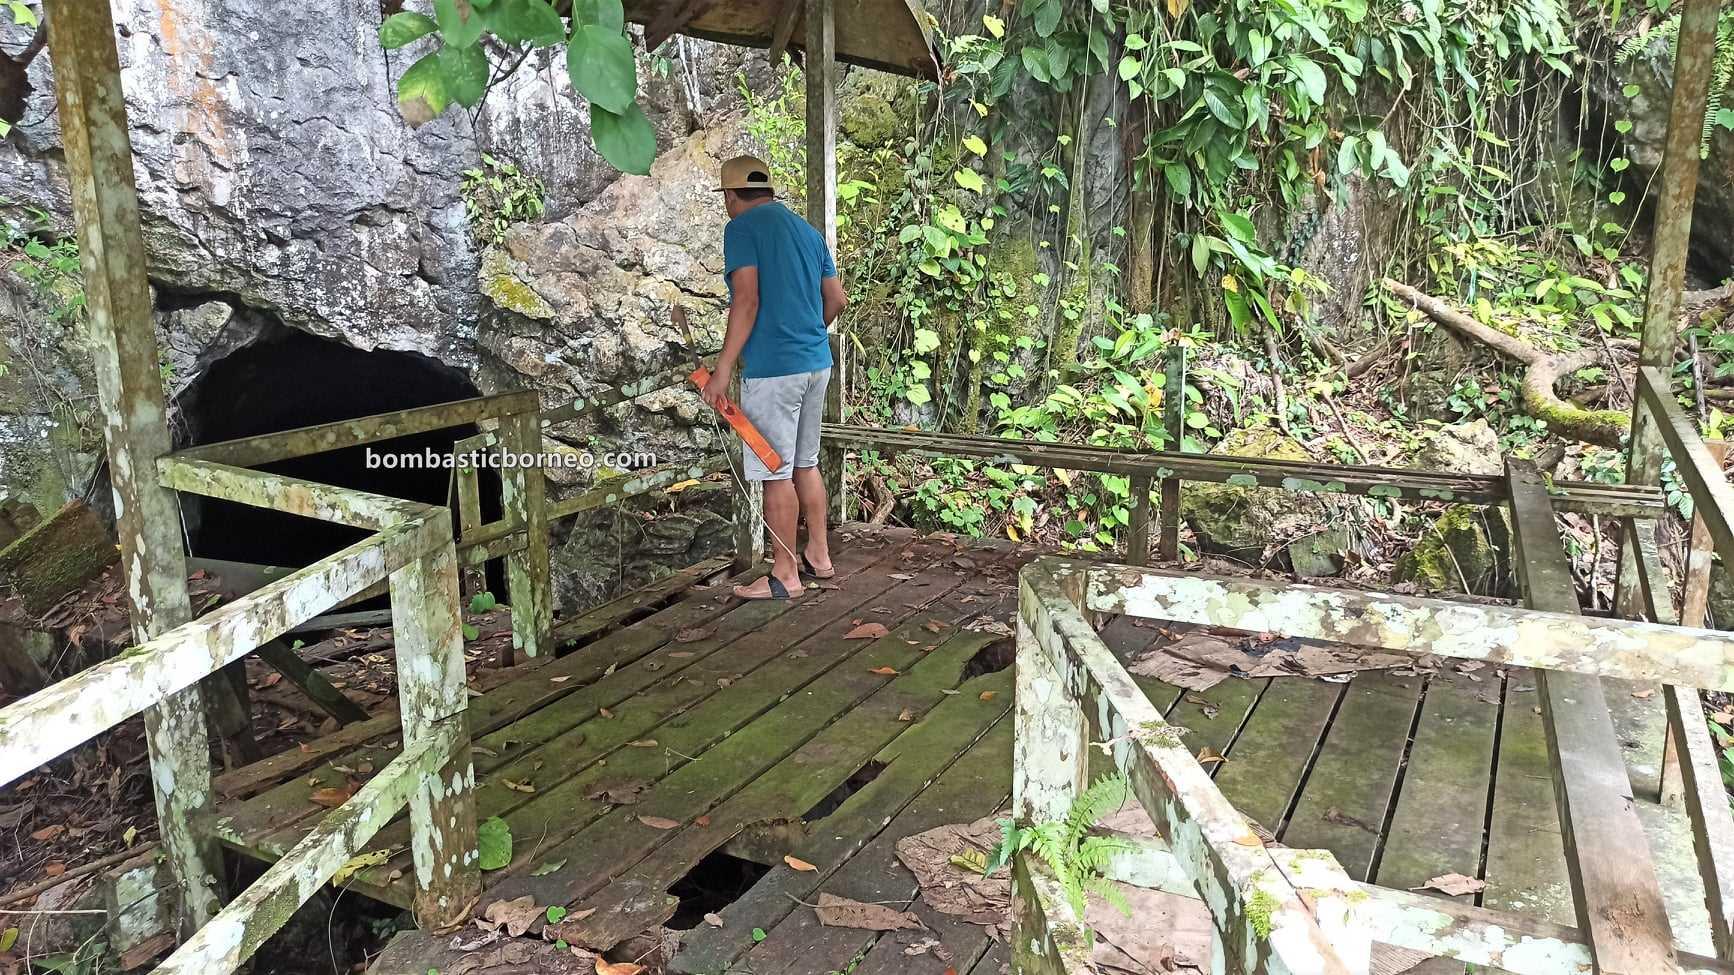 Kampung, Siburan, Serian, Malaysia, destination, exploration, nature, objek wisata, ecotourism, travel guide, Gua Raya, Trans Borneo, 穿越婆罗洲游踪, 马来西亚砂拉越, 西连旅游景点